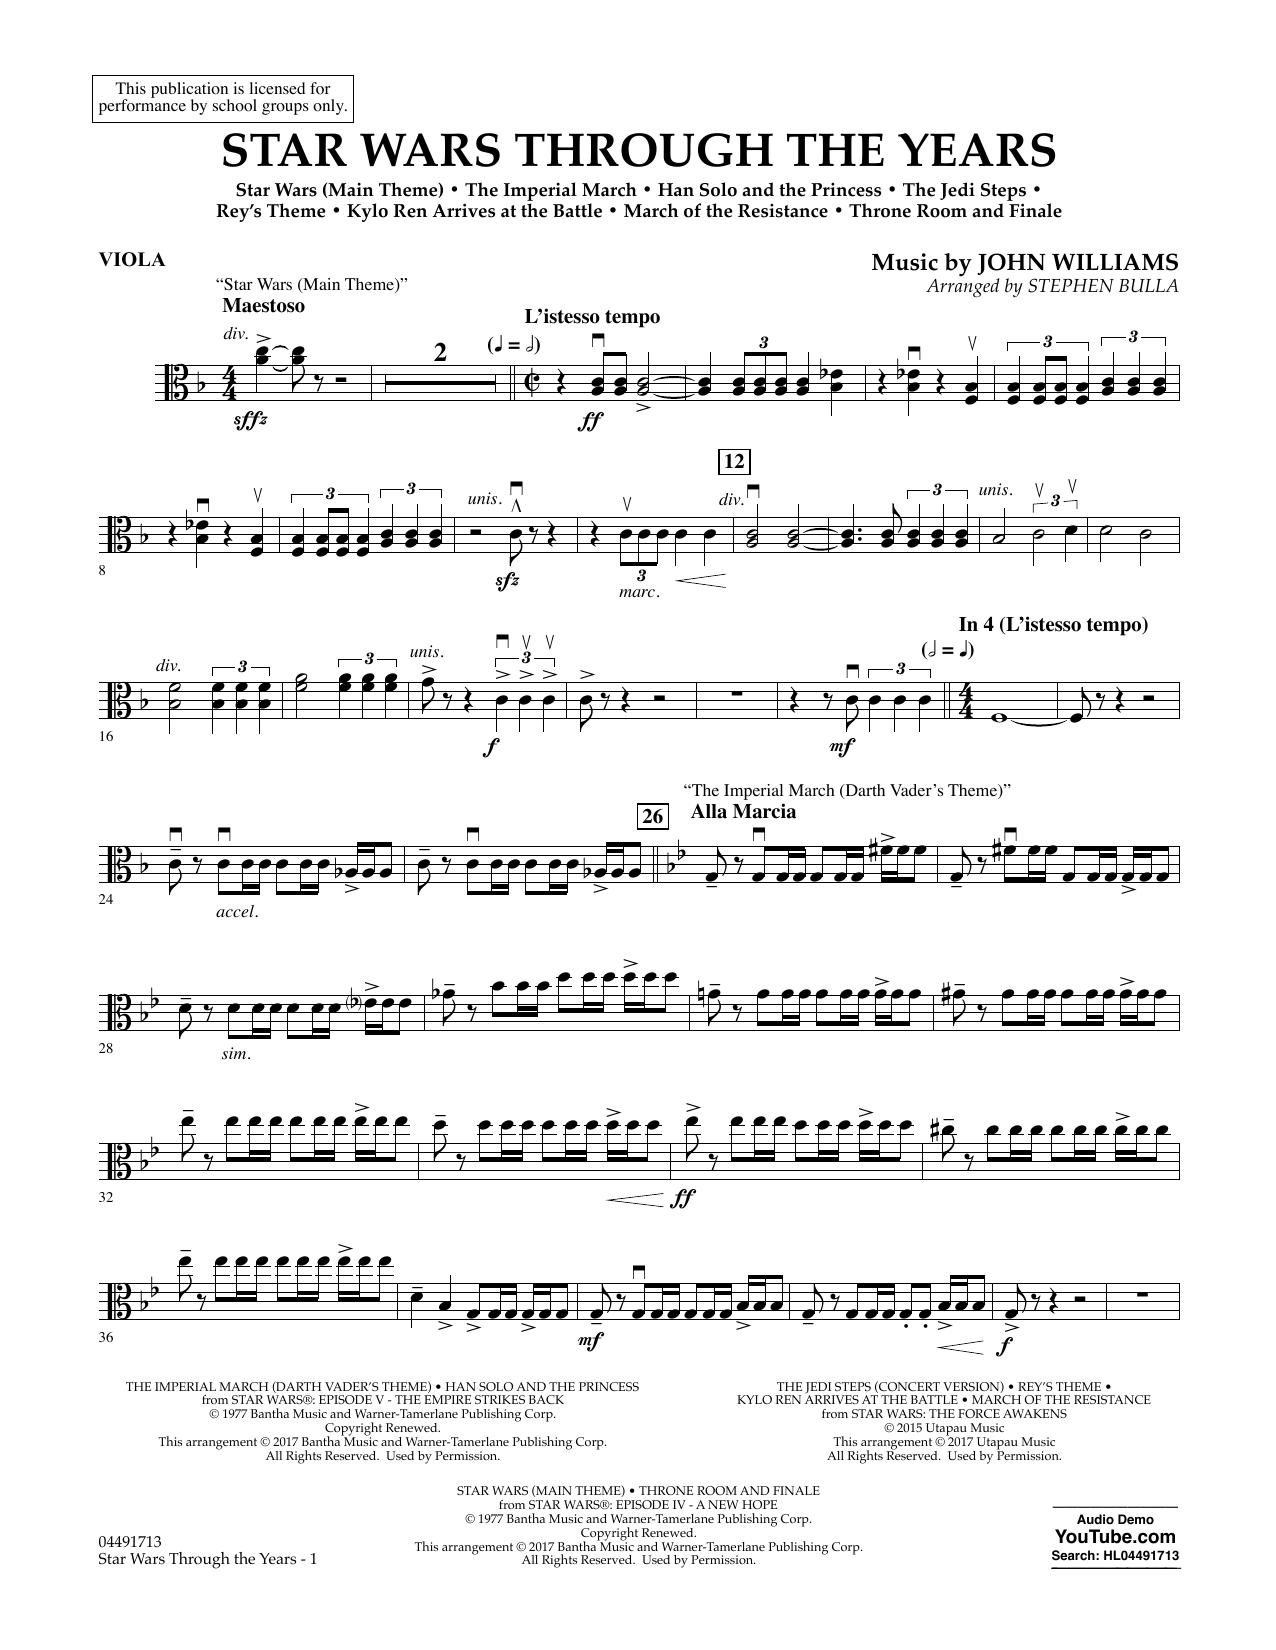 Star Wars Through the Years - Viola Sheet Music